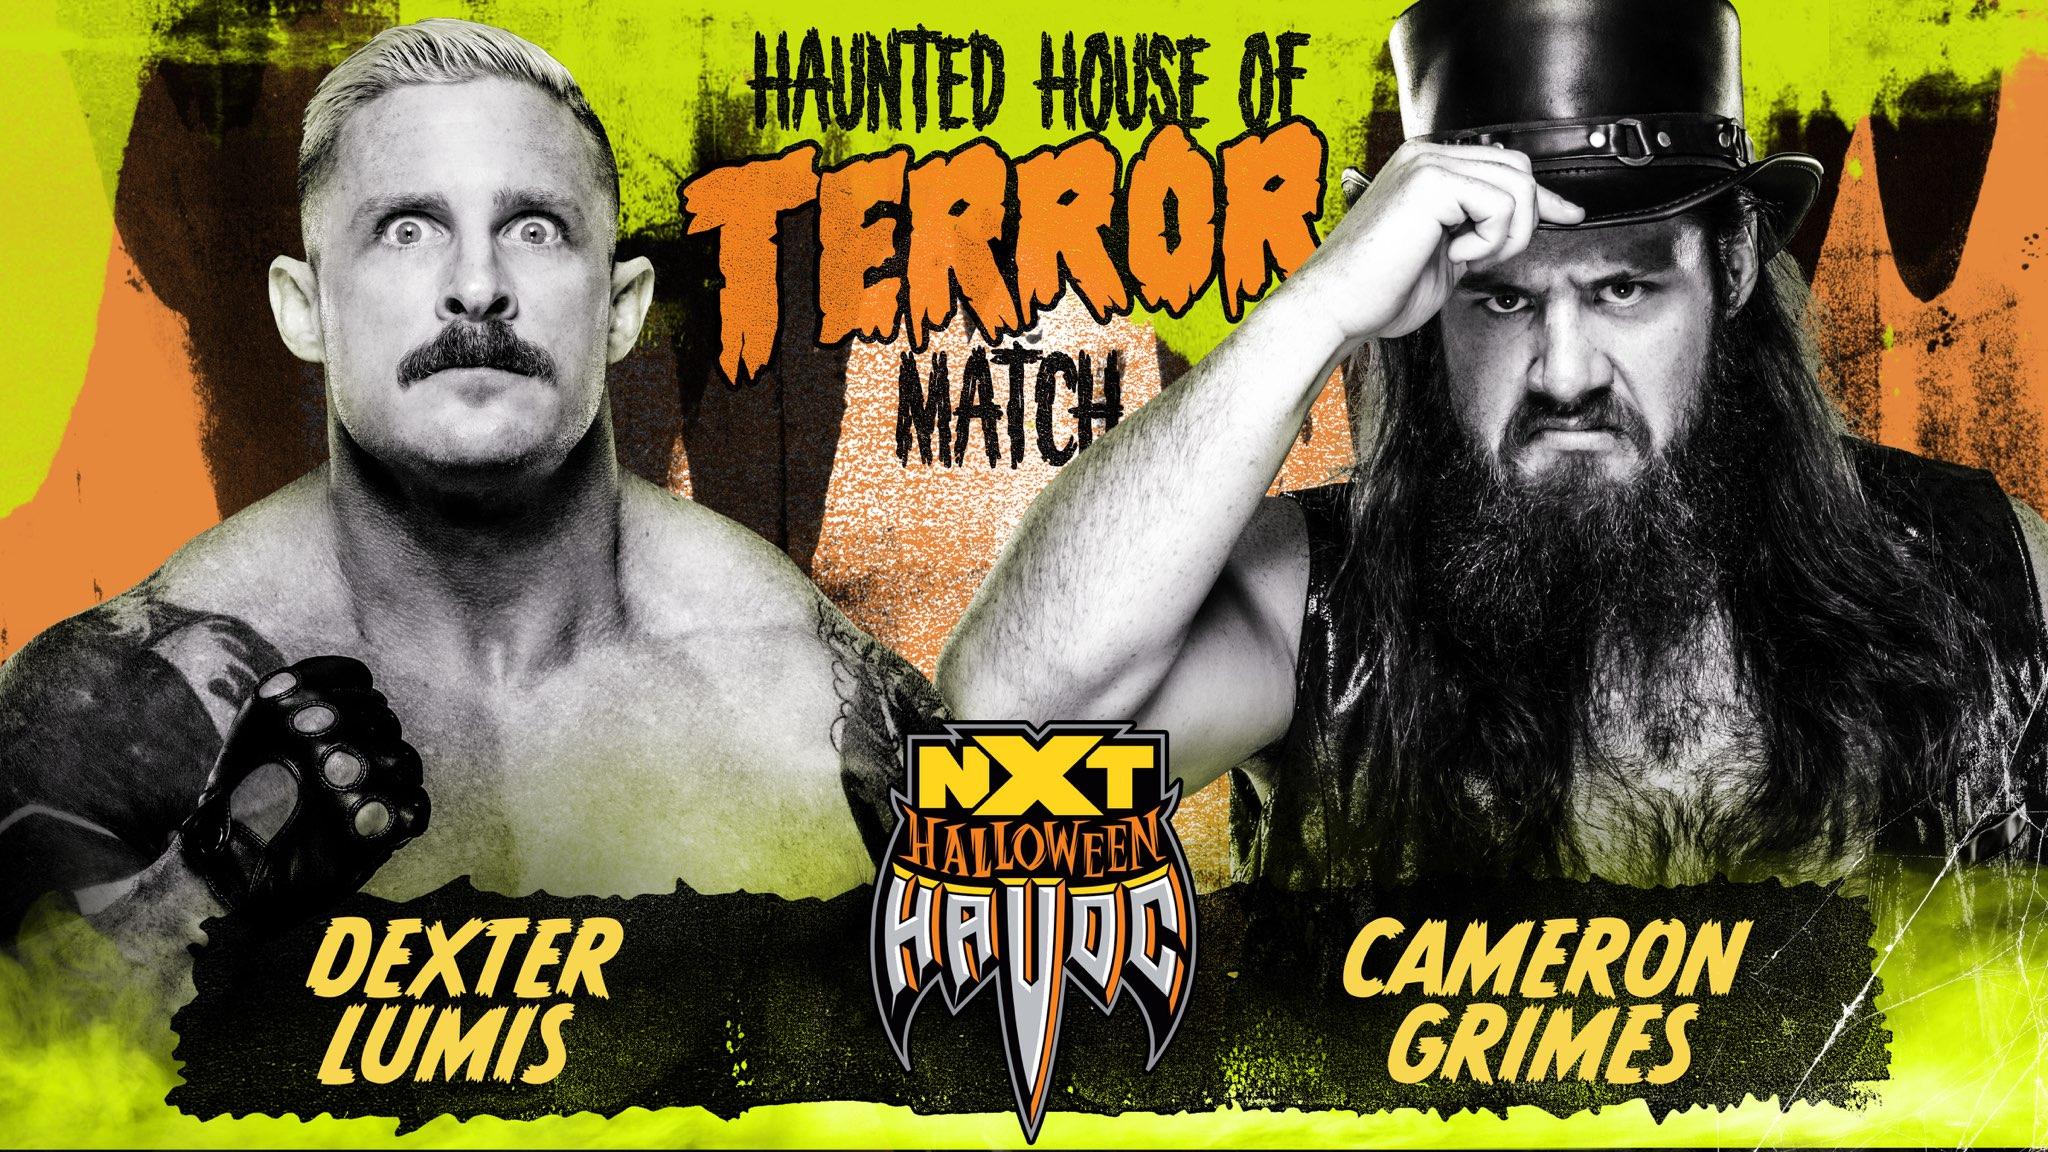 NXT Halloween Havoc Haunted House